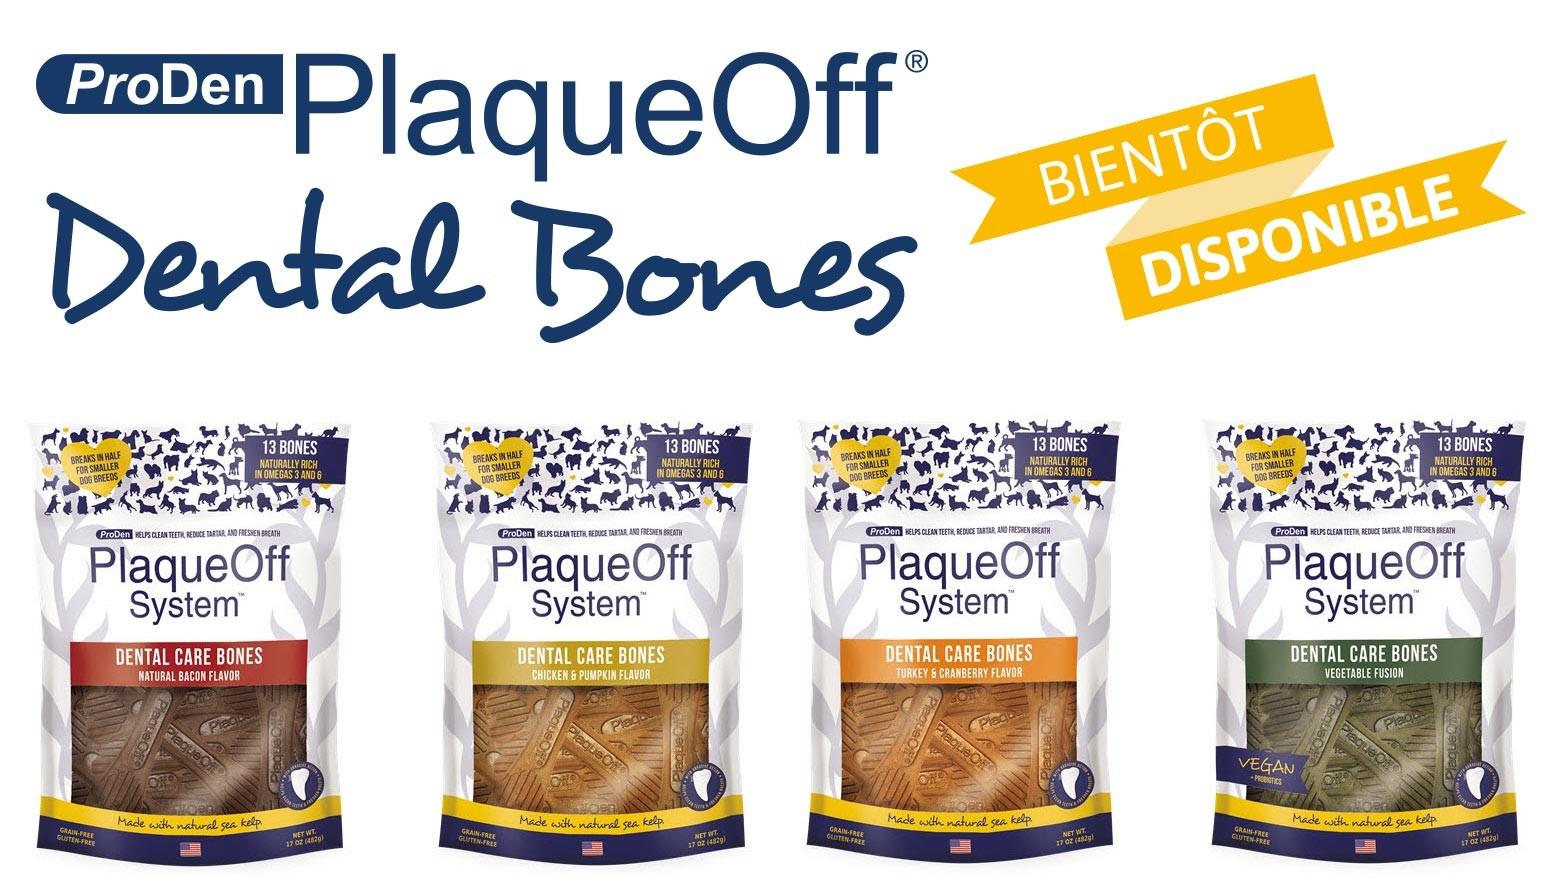 Dental Bones, bientôt disponible